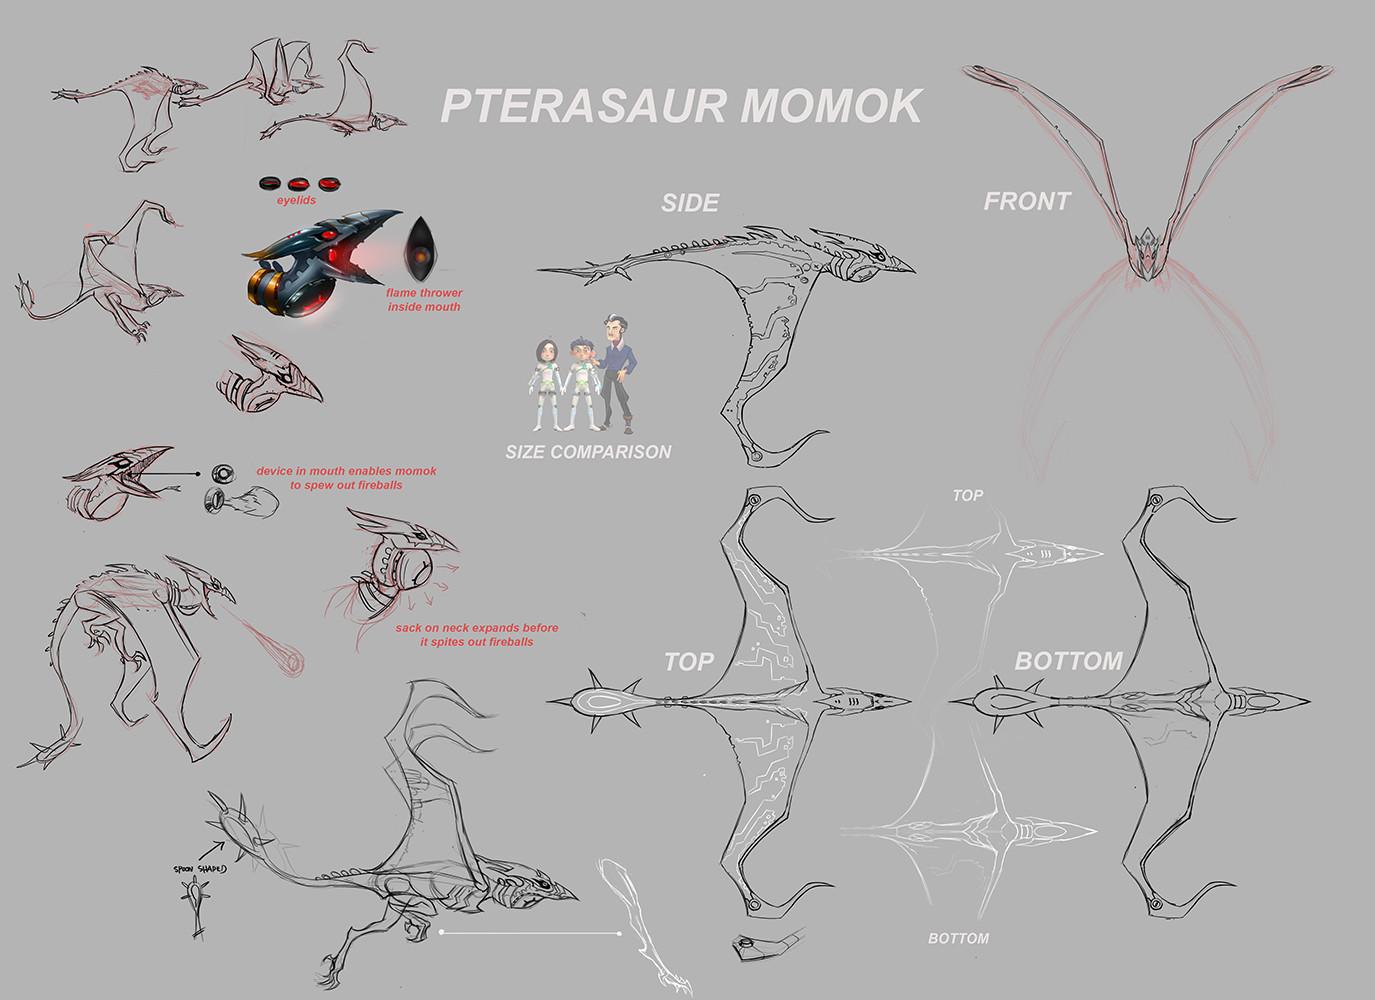 Jose cua pterasaur momok breakdown and notes